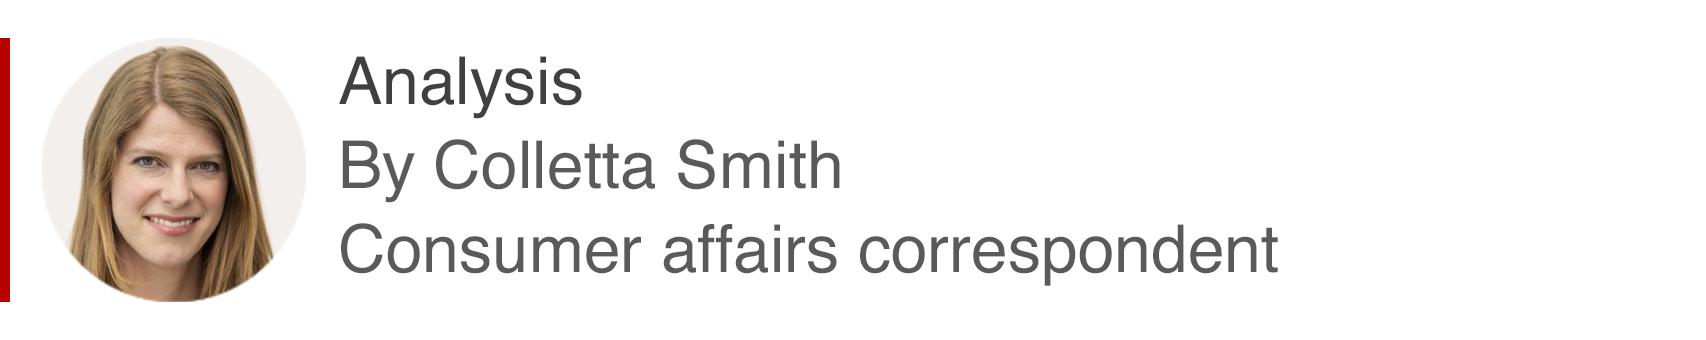 Analysis box by Colletta Smith, Consumer affairs correspondent